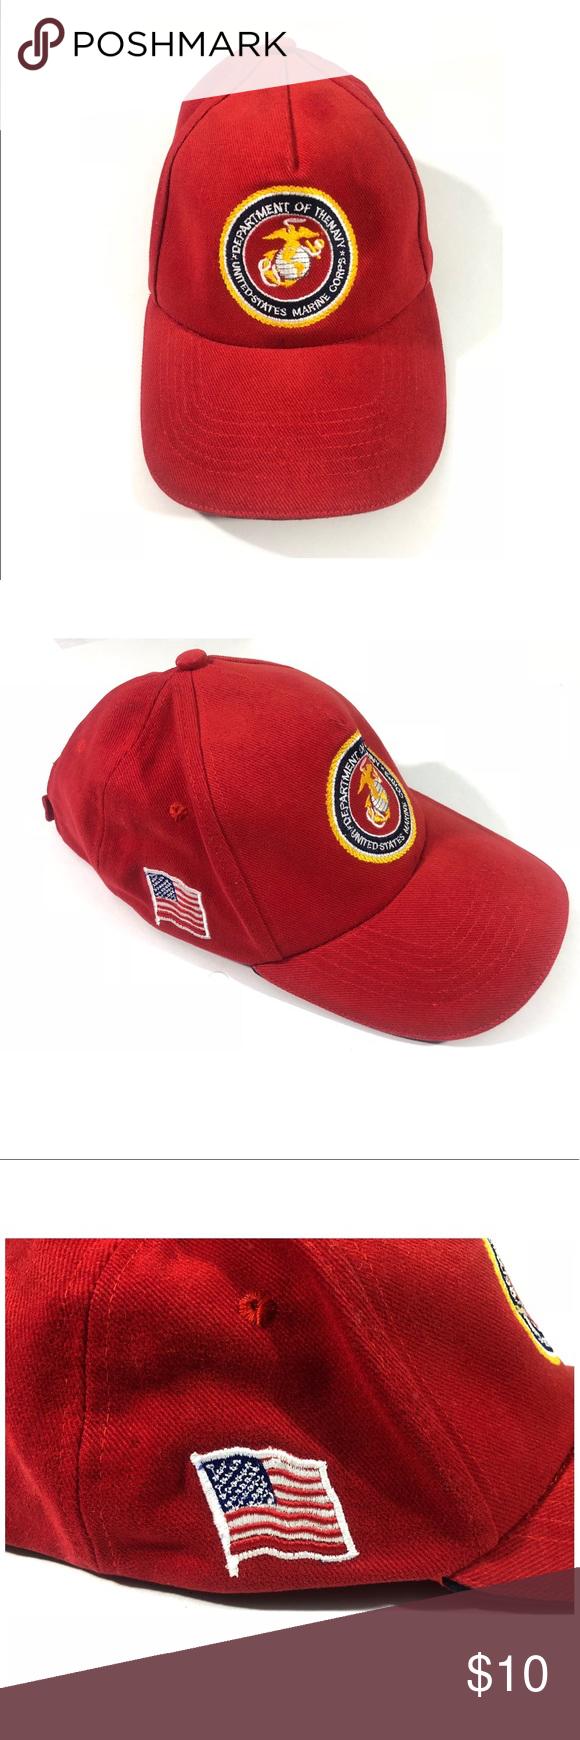 cf4d95c100c USMC Marines Corps Semper Fi Hat Up for sale I have a men s Marine Corps  United